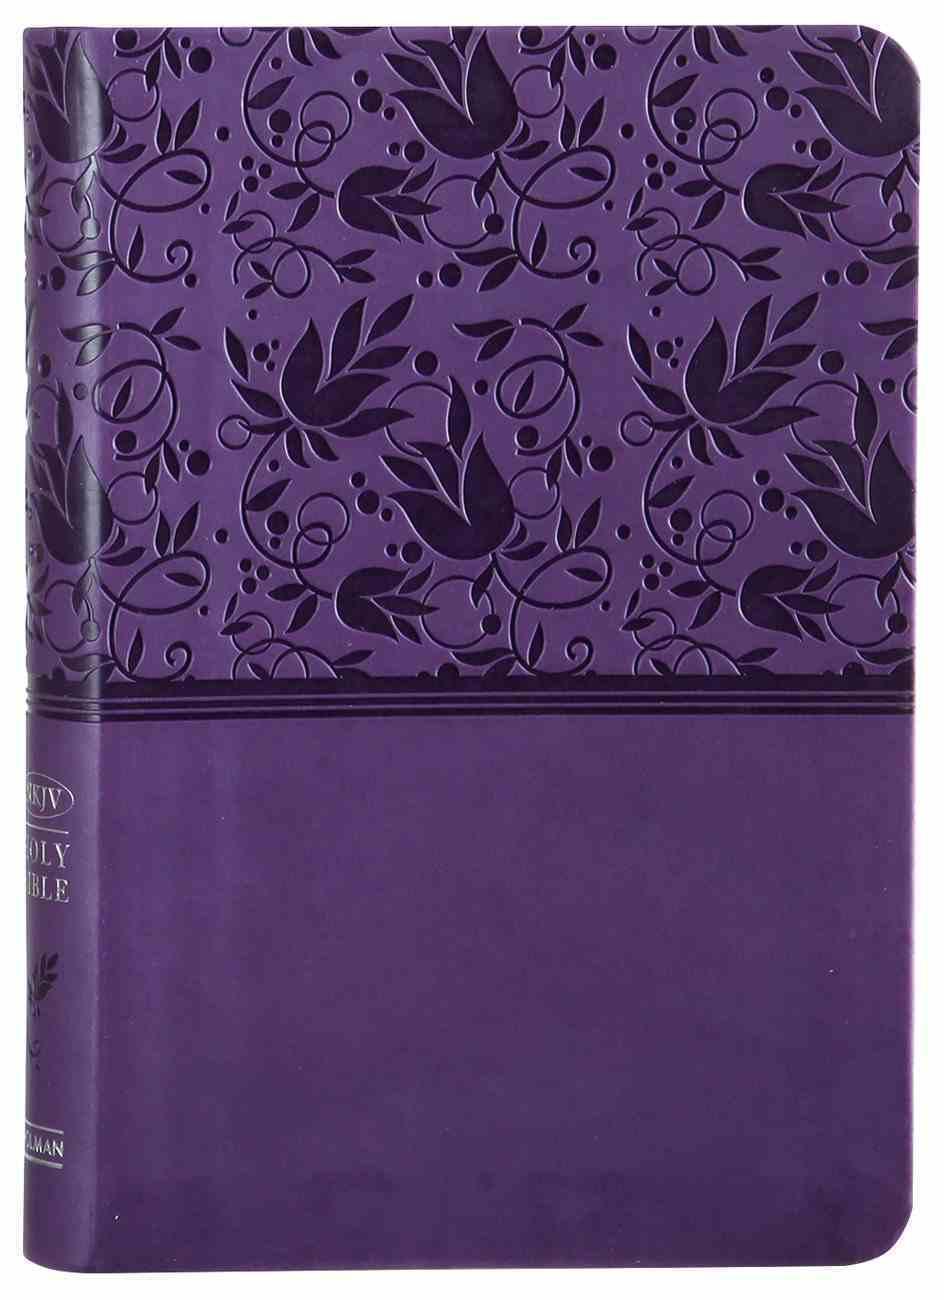 NKJV Compact Ultrathin Bible Purple Premium Imitation Leather